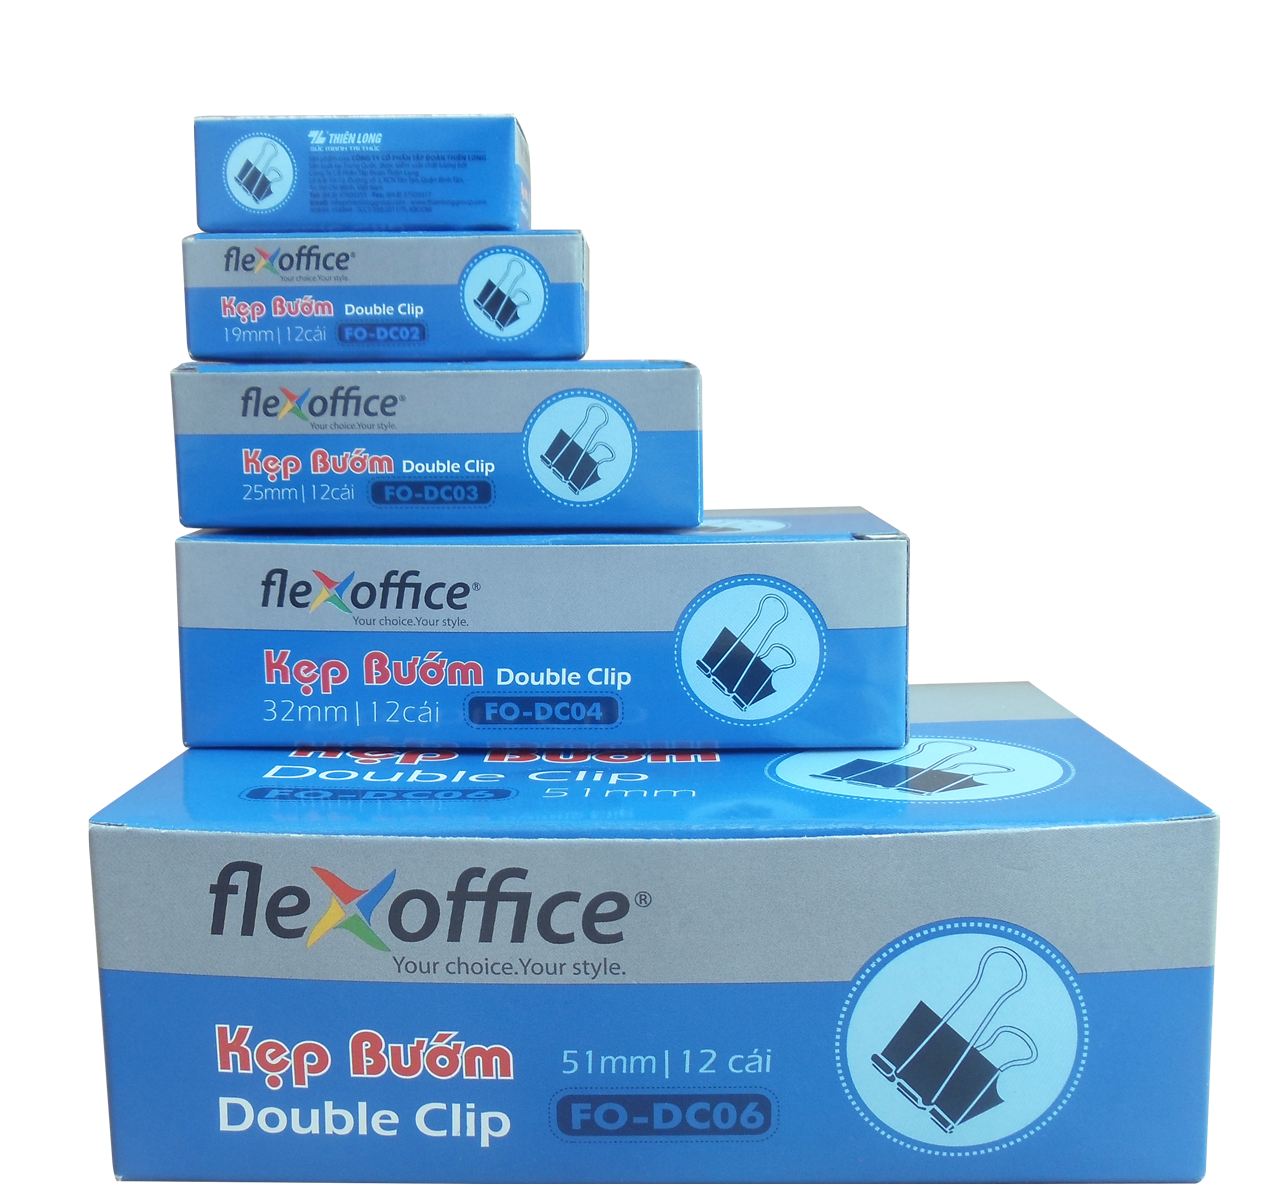 hộp đựng kẹp bướm FO (double clip flexoffice)